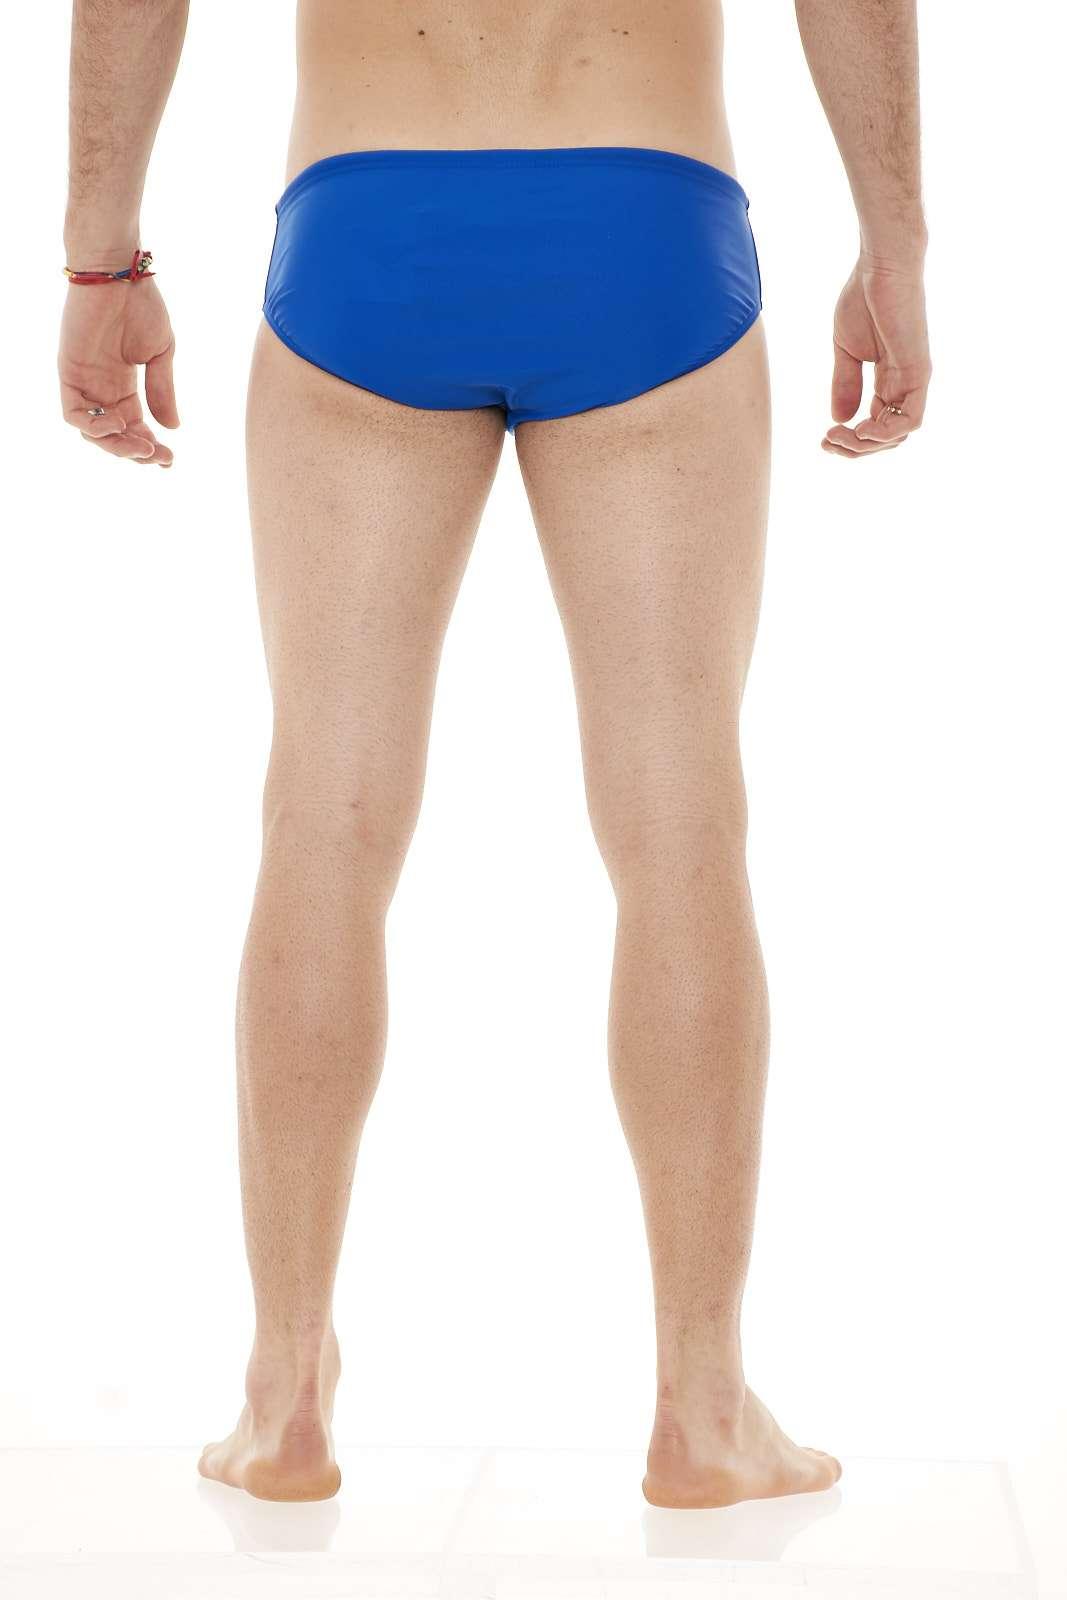 https://www.parmax.com/media/tmp/catalog/product/p/e/pe-outlet_parmax-costume-uomo-rrd18332-c.jpg